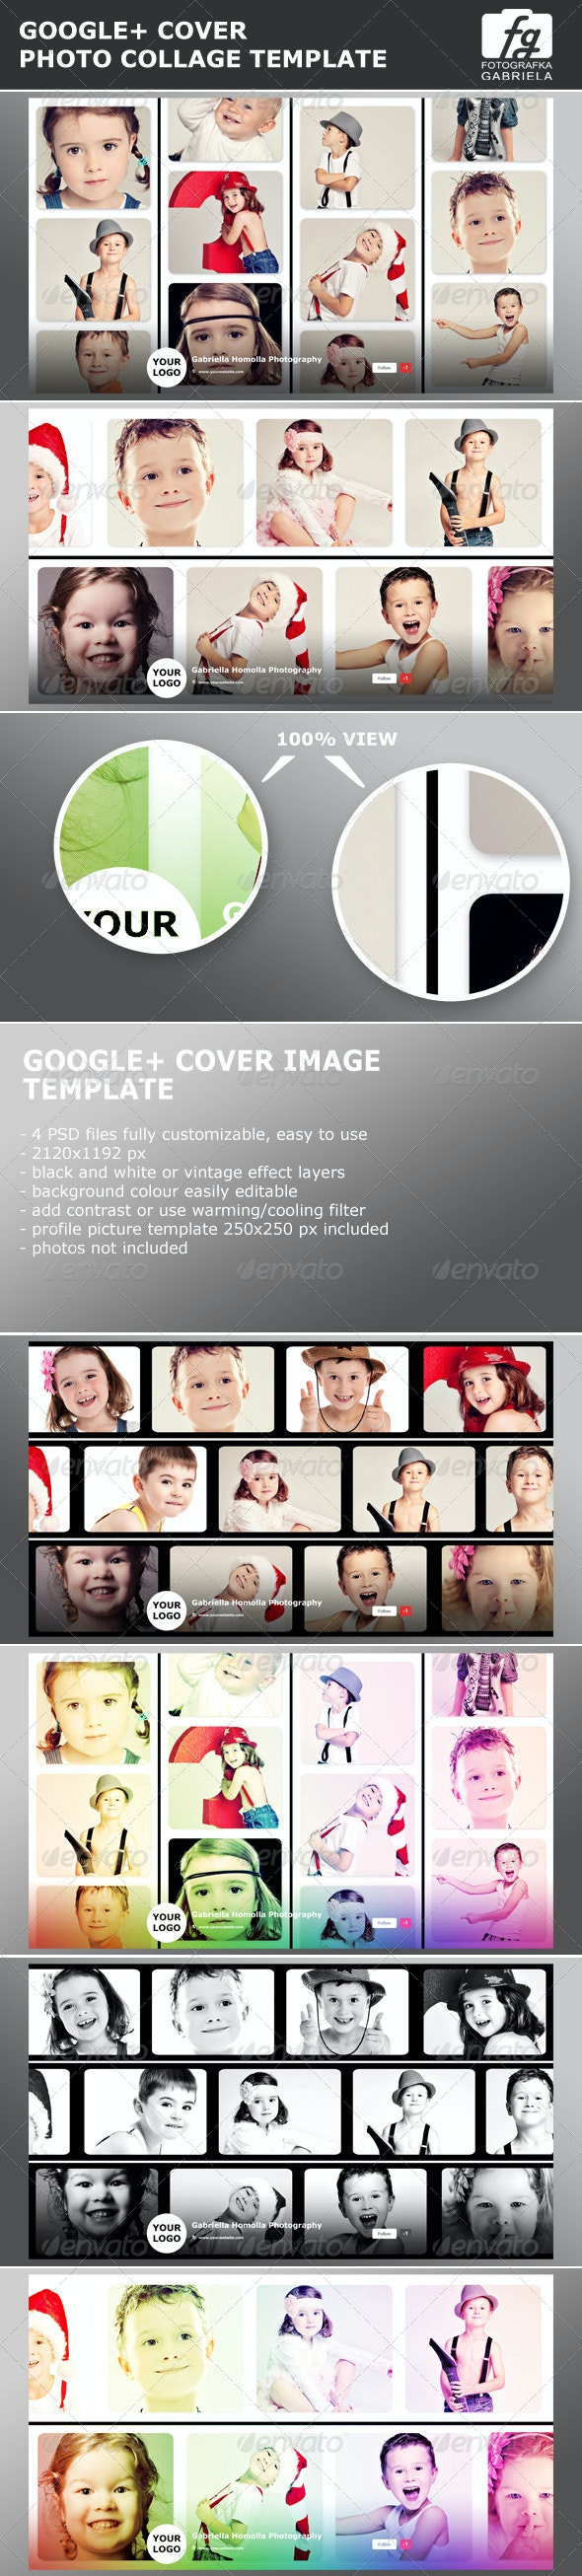 Google Photo Collage Photoshop Template By Fotografkagabriela Graphicriver